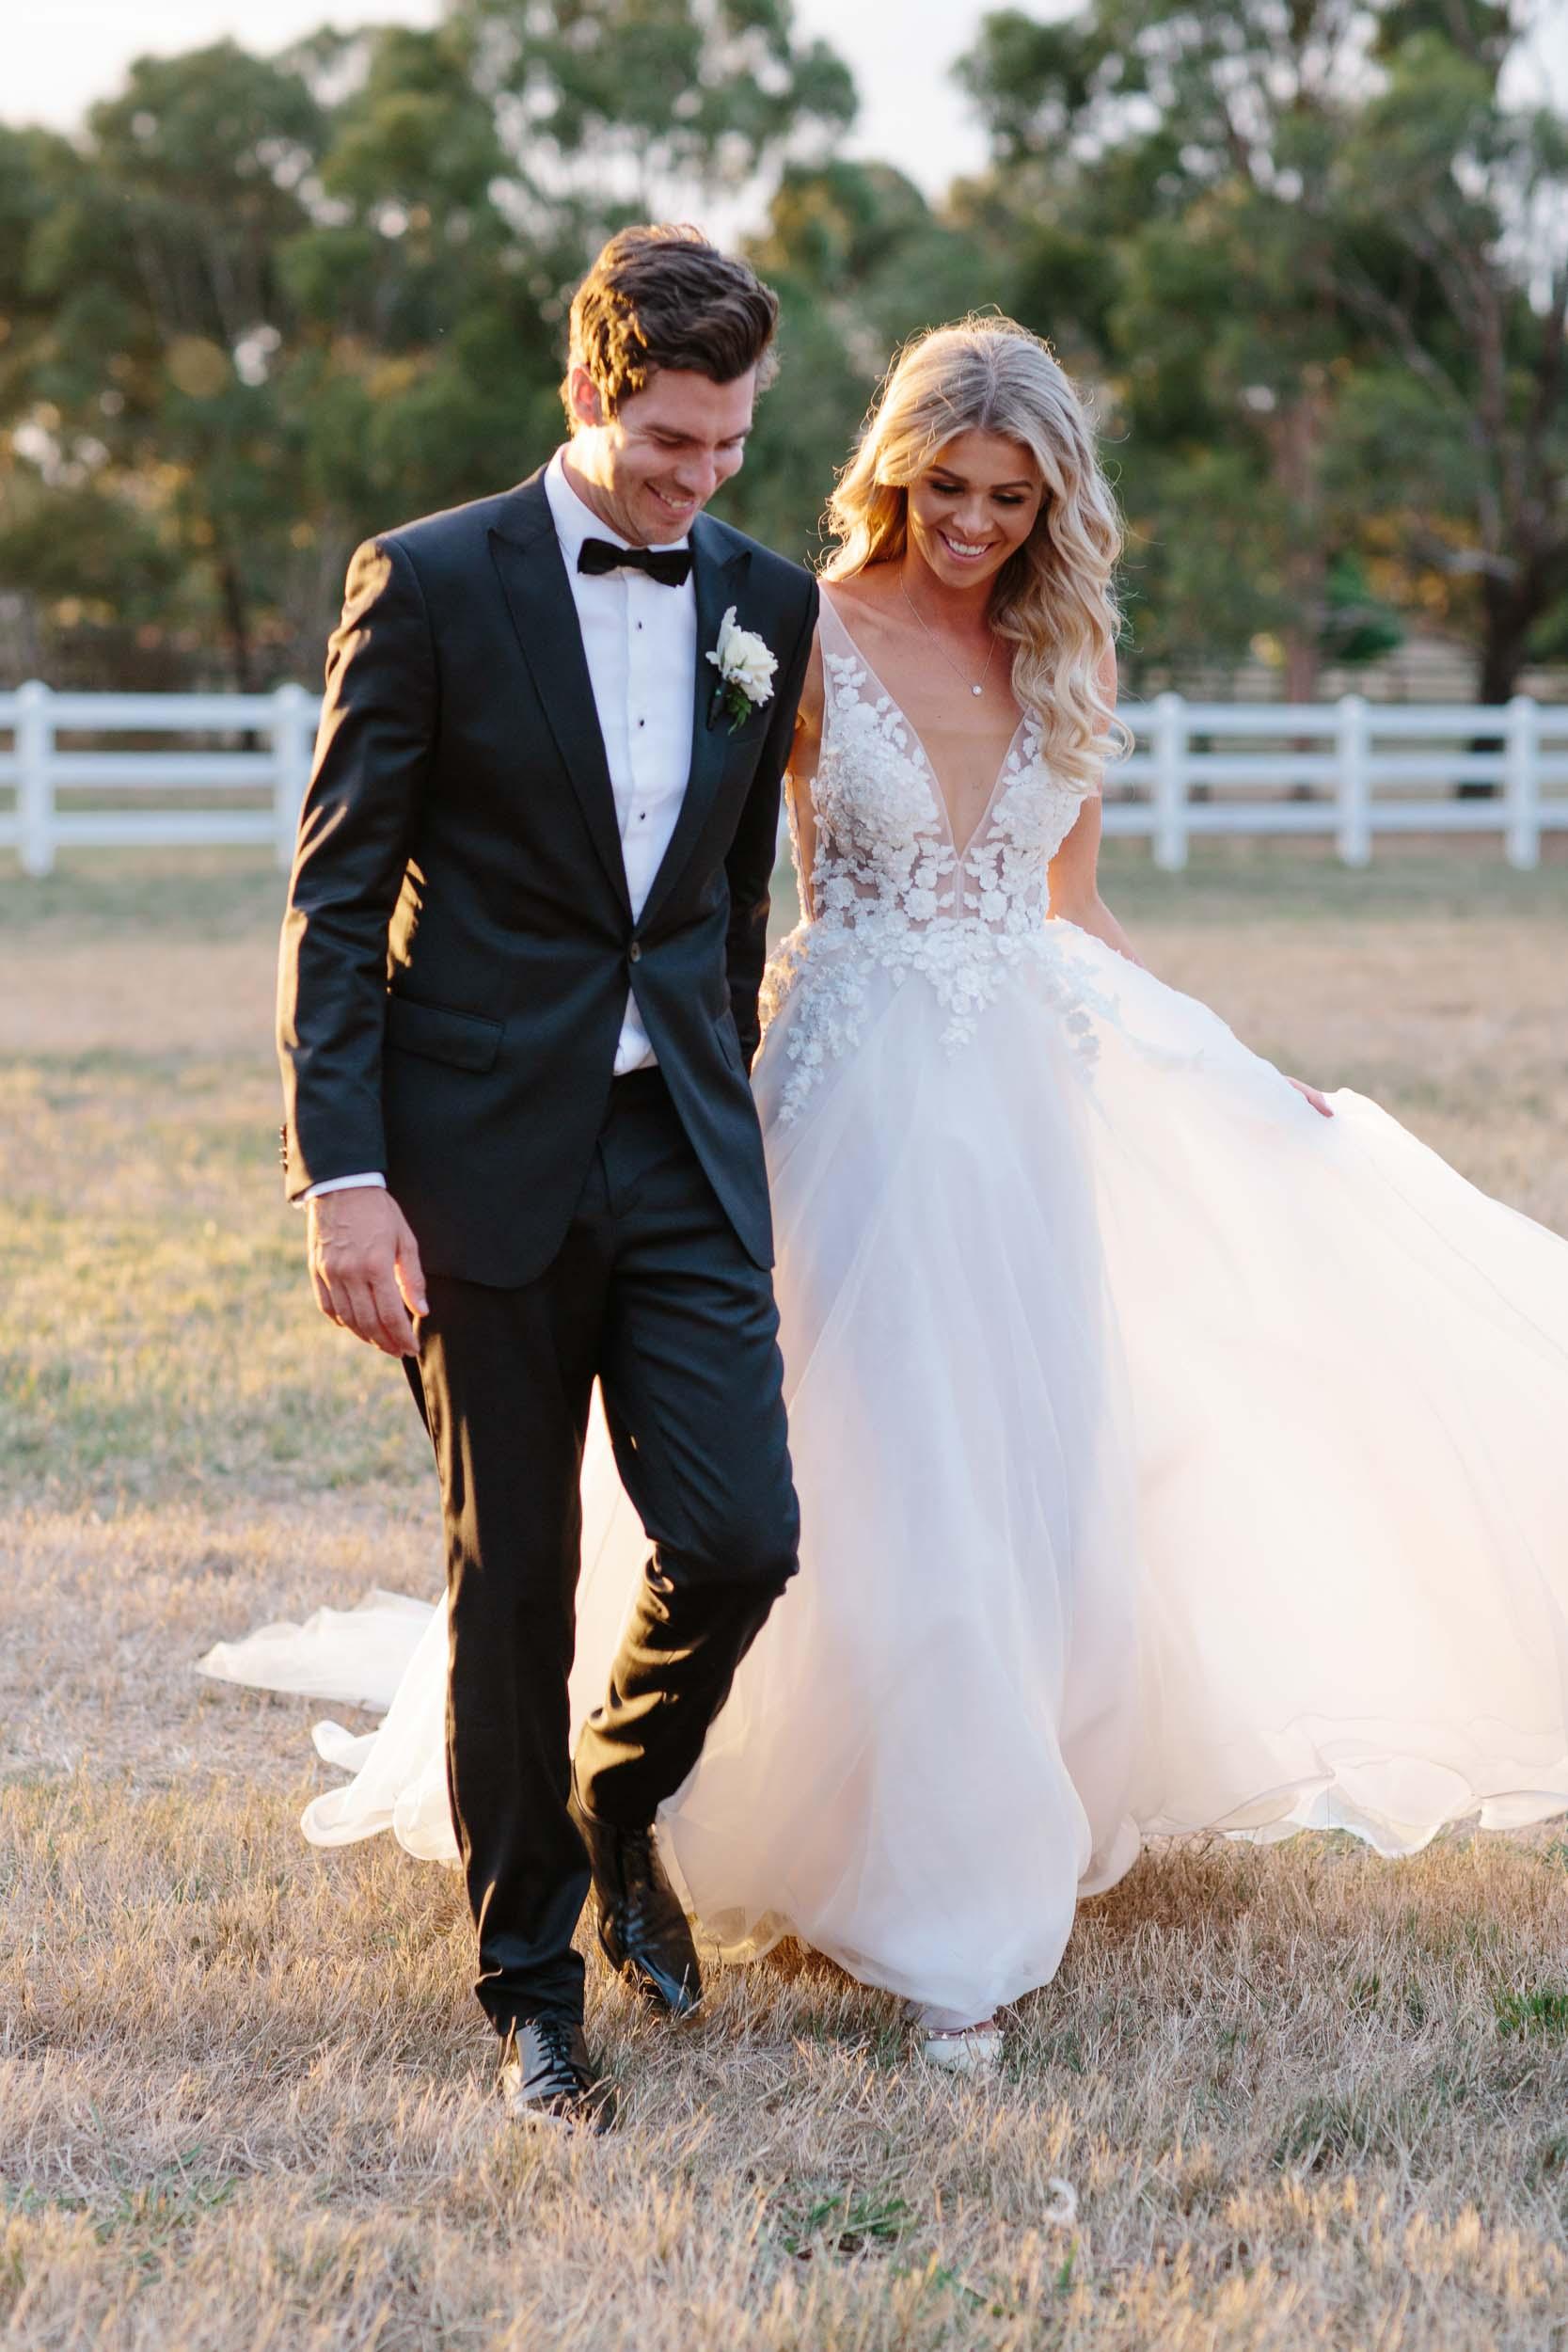 Kas-Richards-Mornington-Peninsula-Private-Property-Wedding-Marianna-Hardwick-Gown-685.jpg